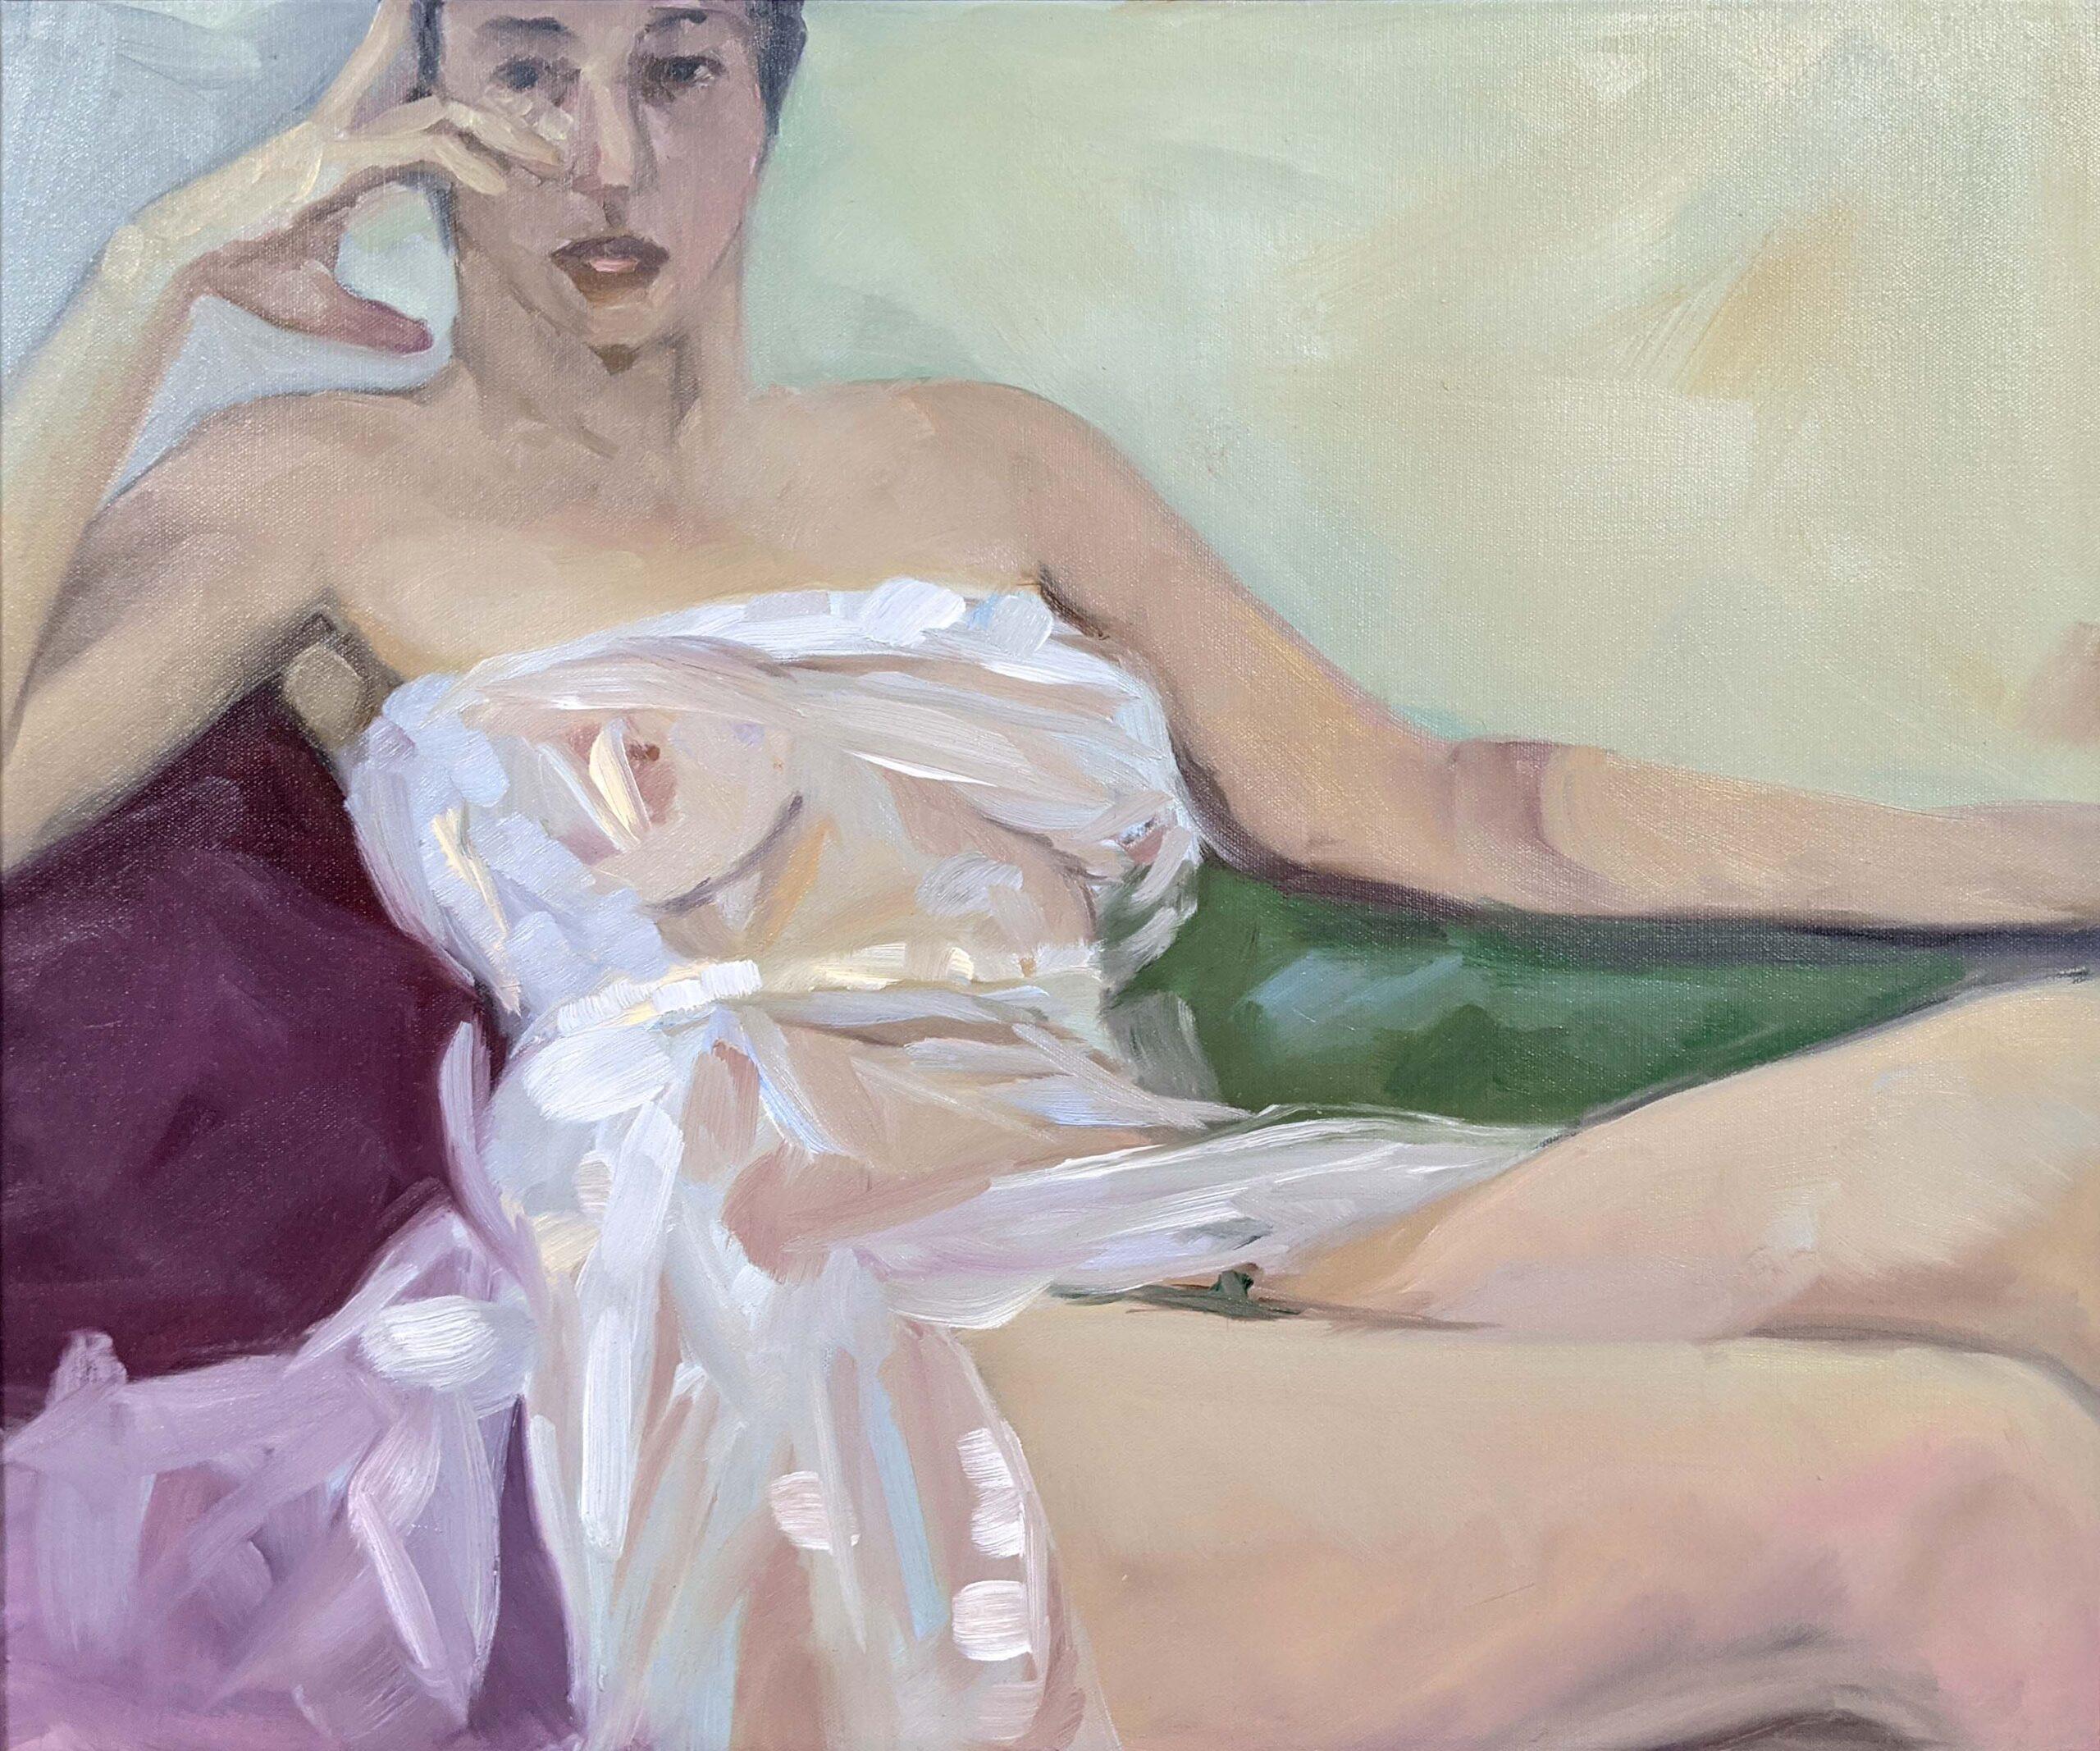 """Saran Wrap Cynic,"" oil on canvas, available through Rye Arts Center."